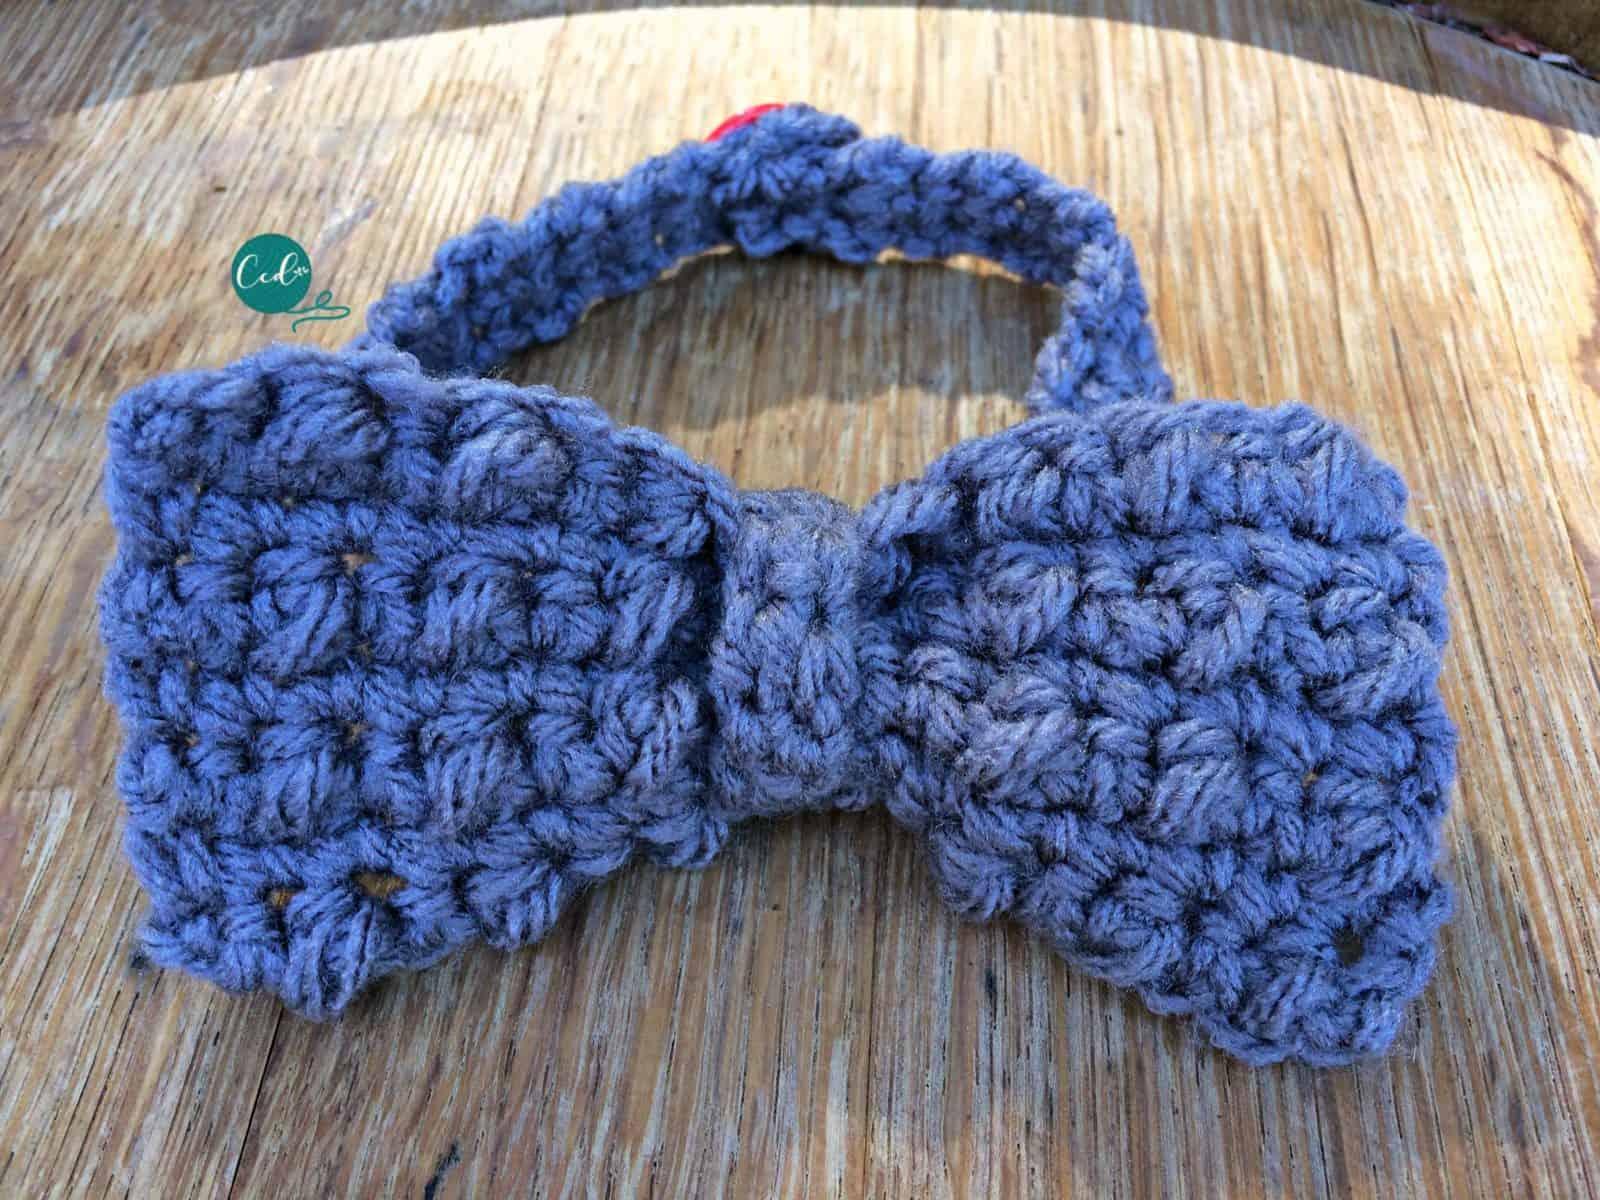 Crochet Bow Tie Tutorial & Free Pattern - ChristaCoDesign